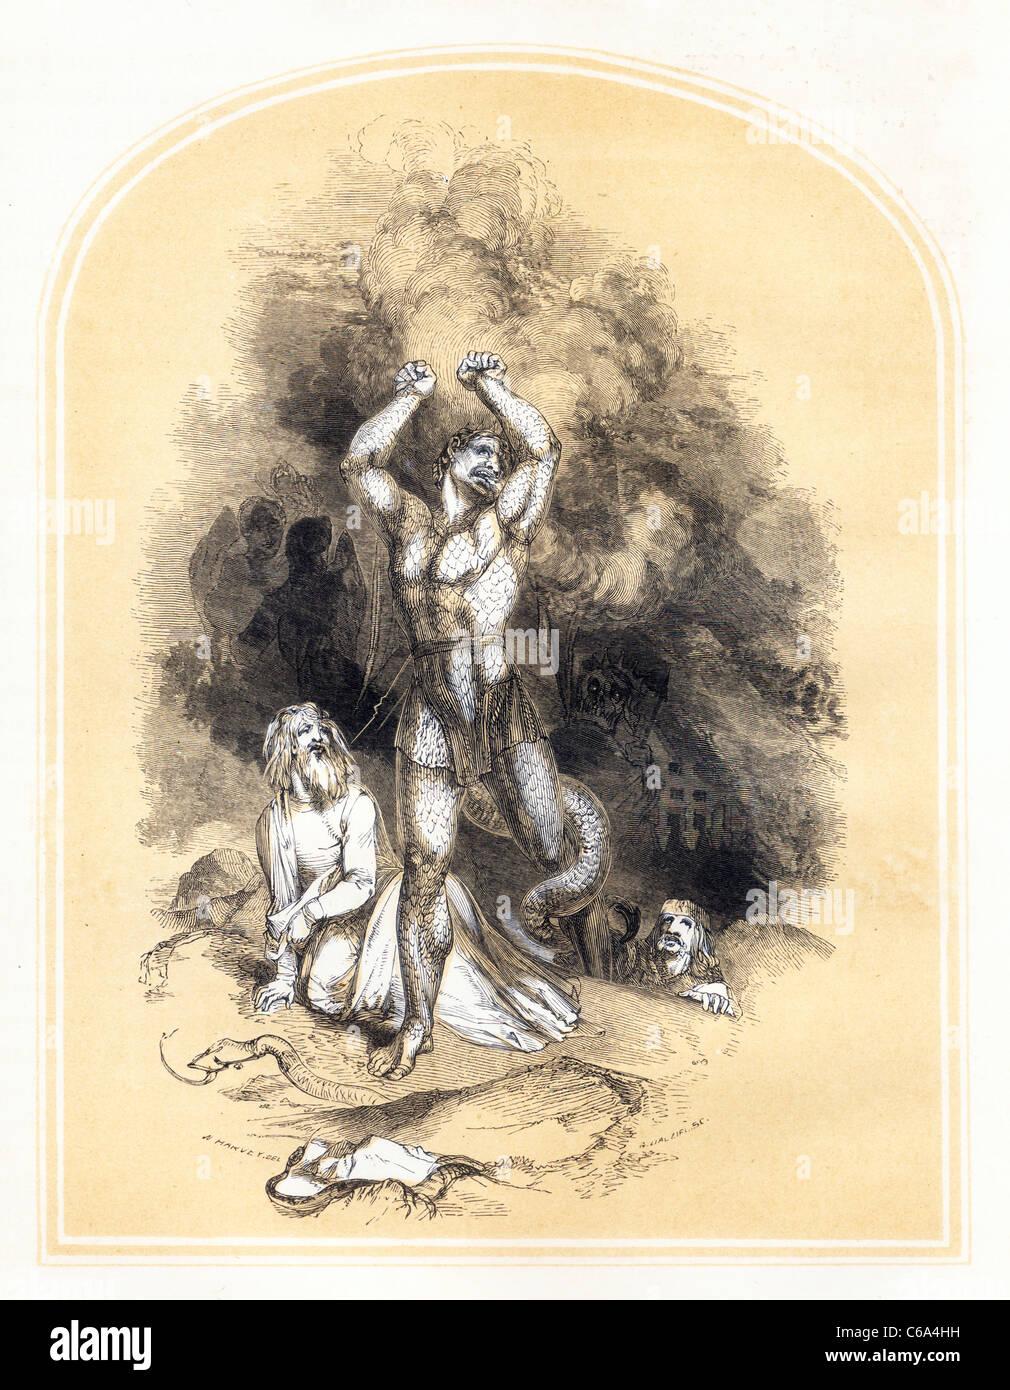 Diabolous fait rage de John Bunyan's Holy War Photo Stock